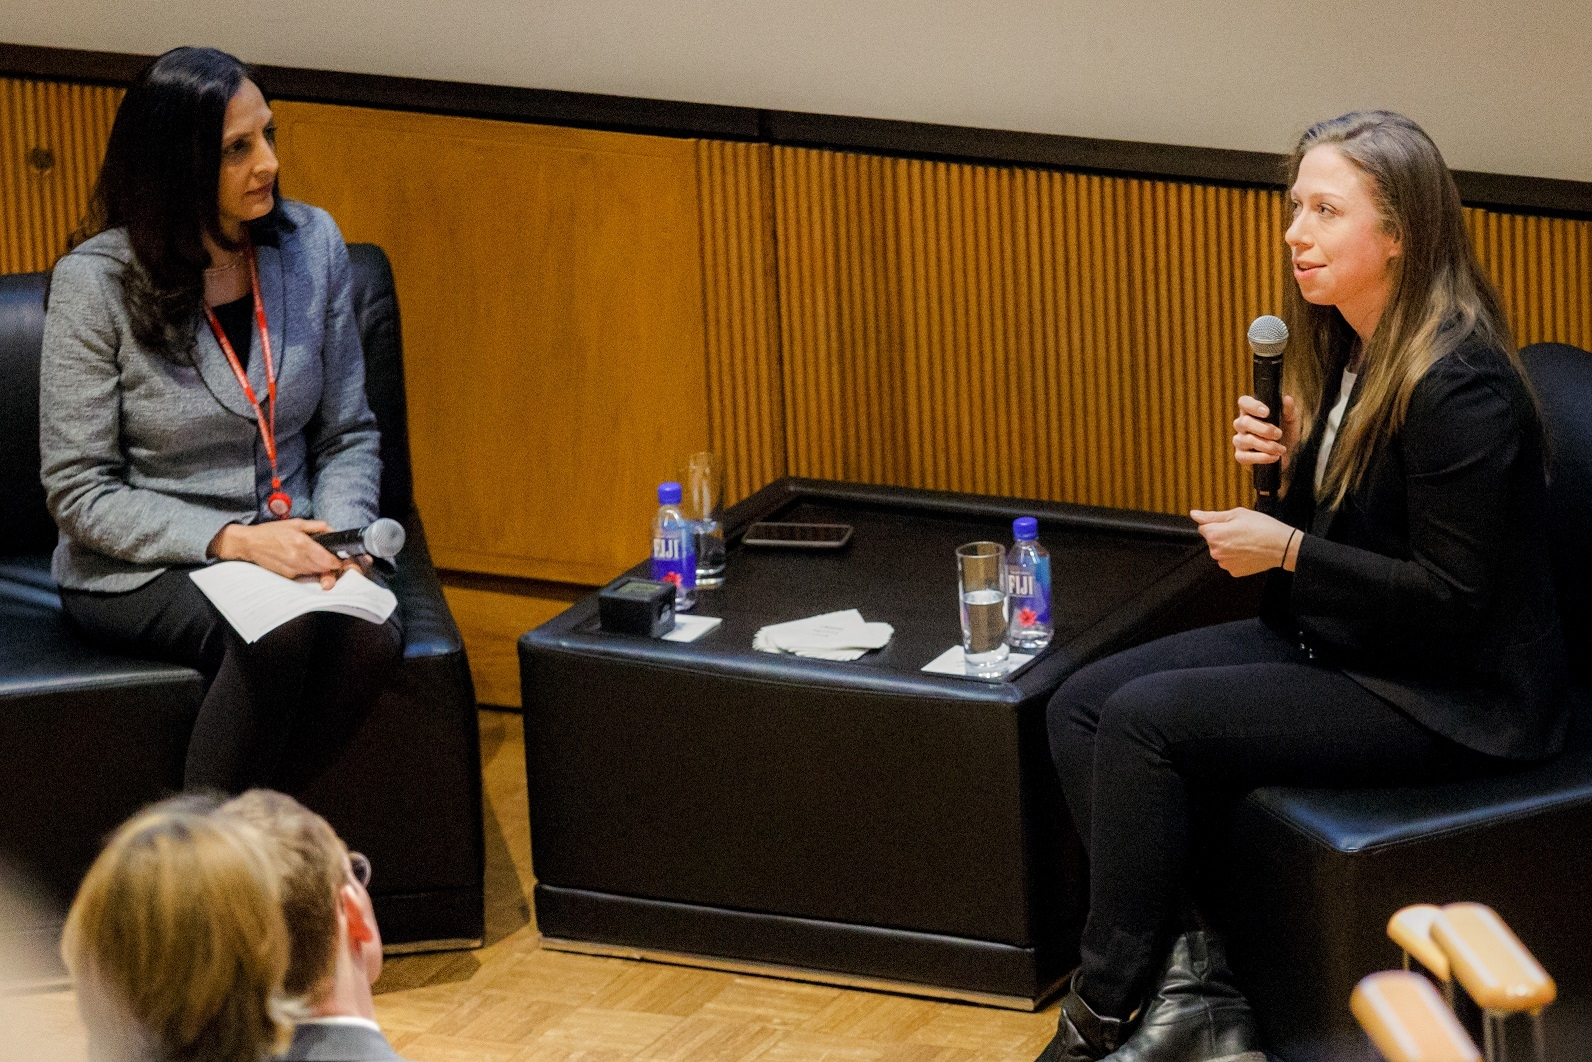 Dr. Rainu Kaushal and Chelsea Clinton